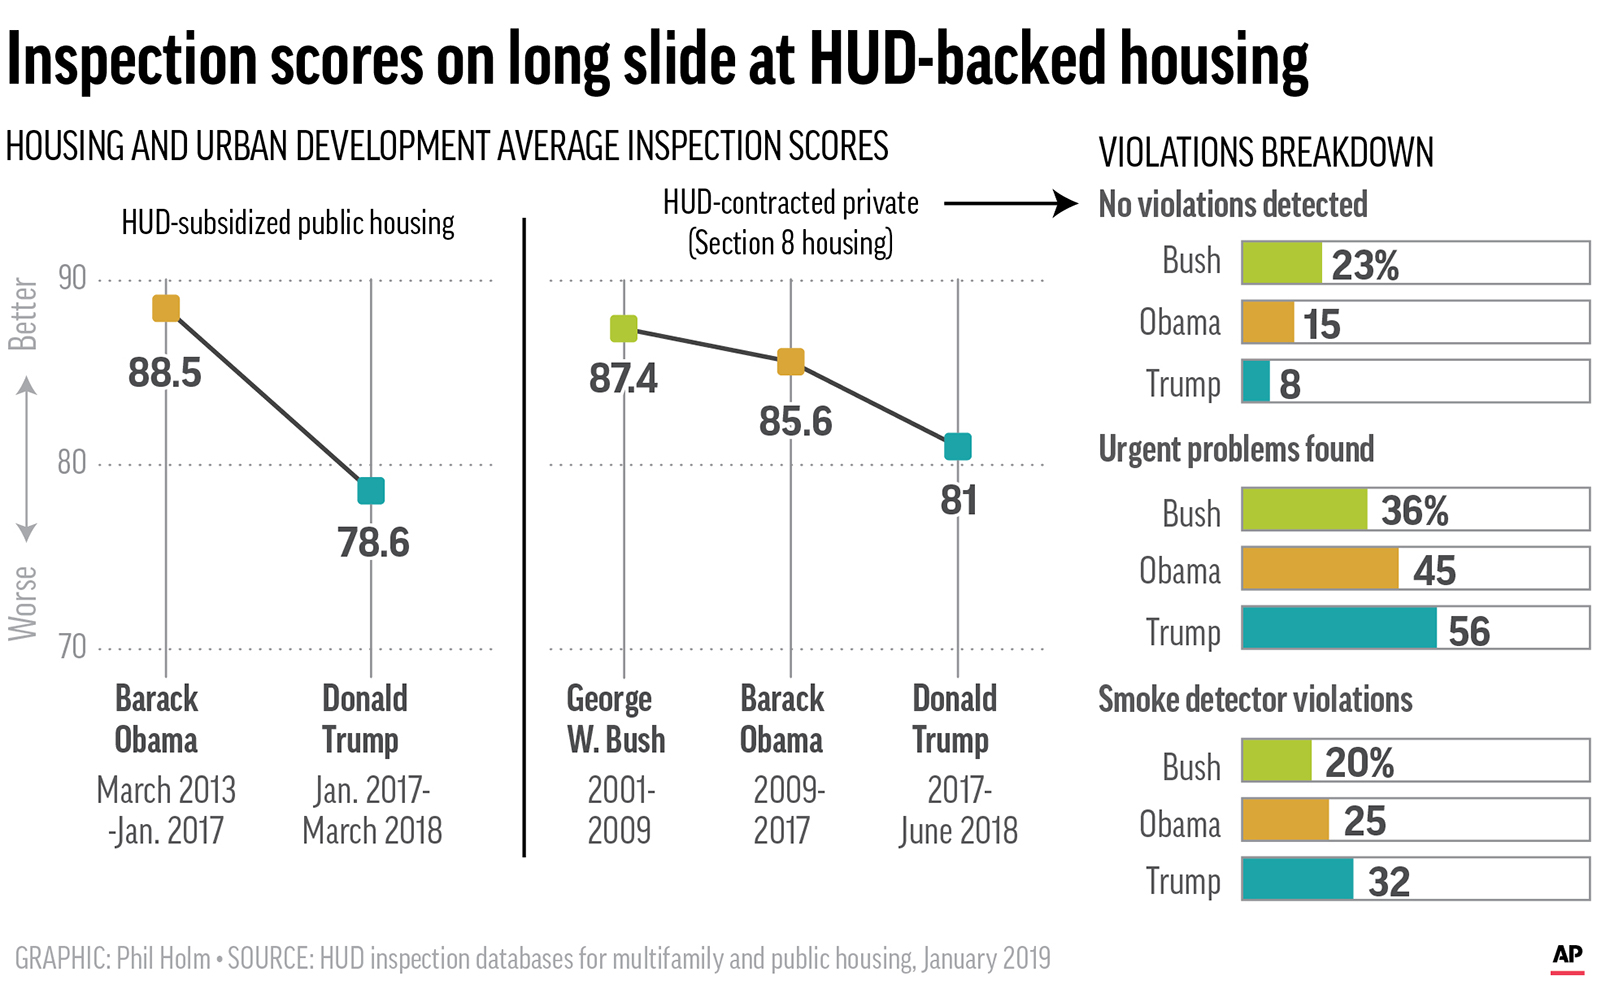 (AP Graphic/Phil Holm)